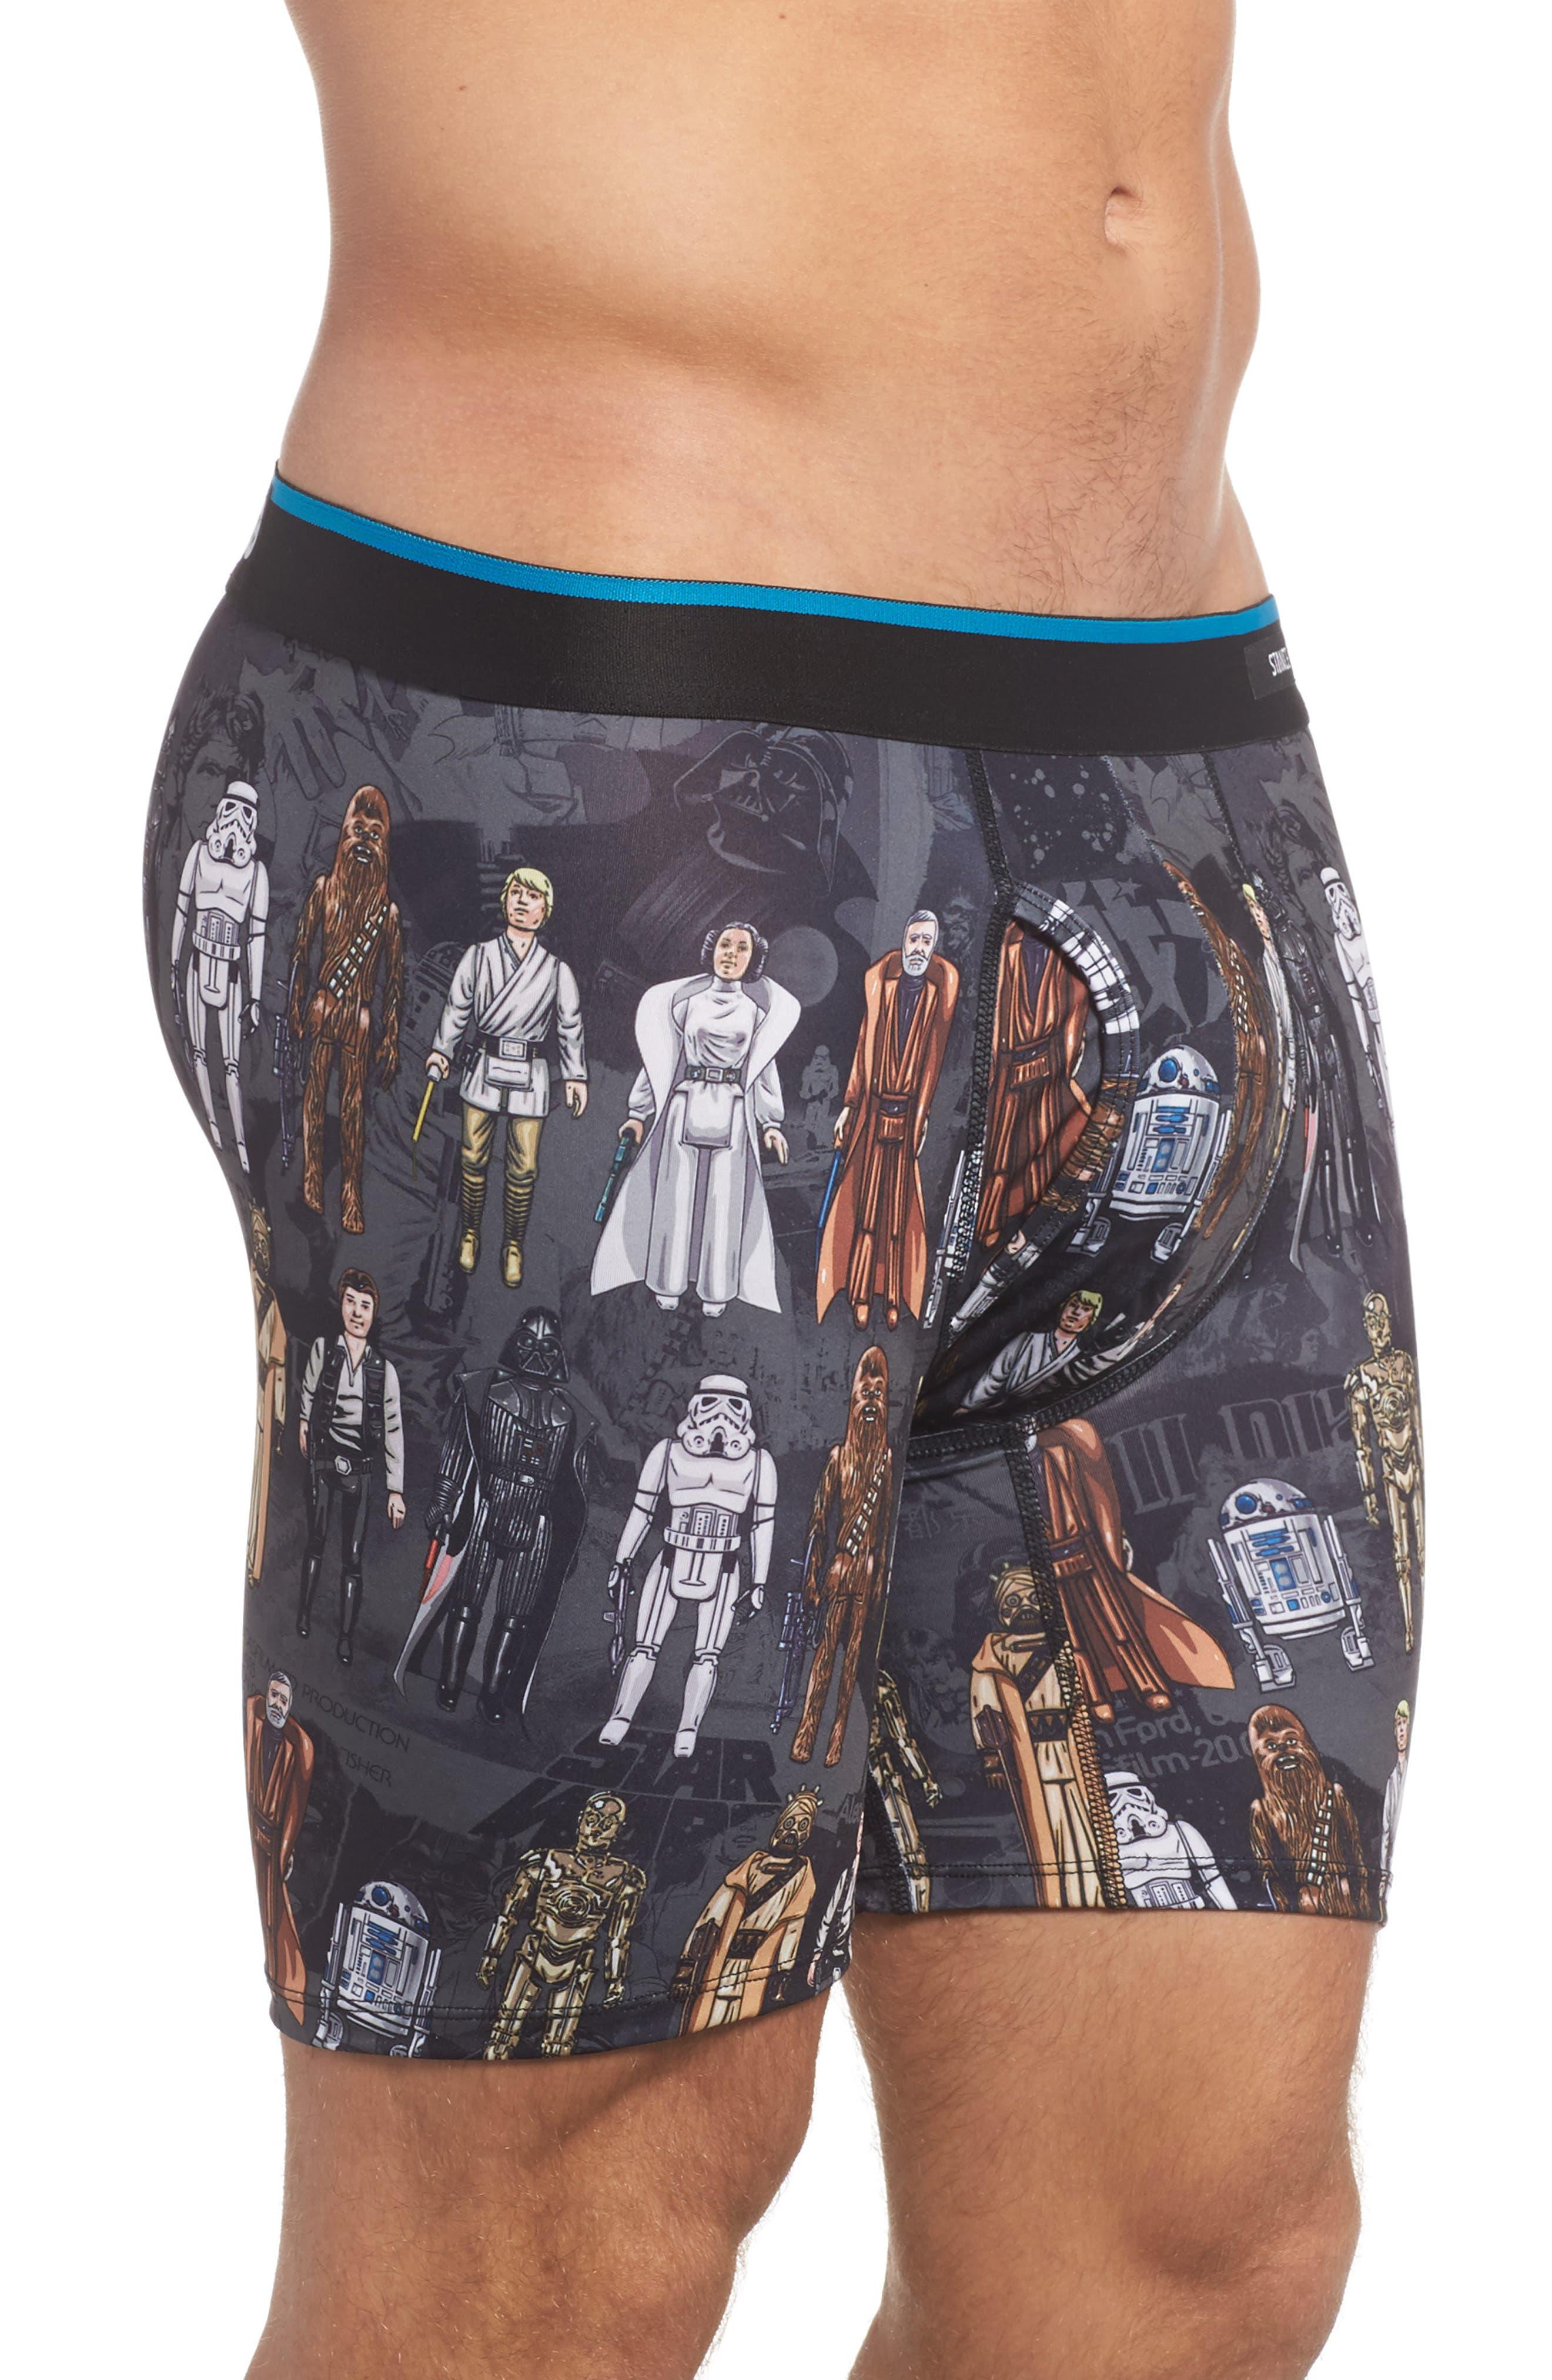 Star Wars<sup>™</sup> Boxer Briefs,                             Alternate thumbnail 3, color,